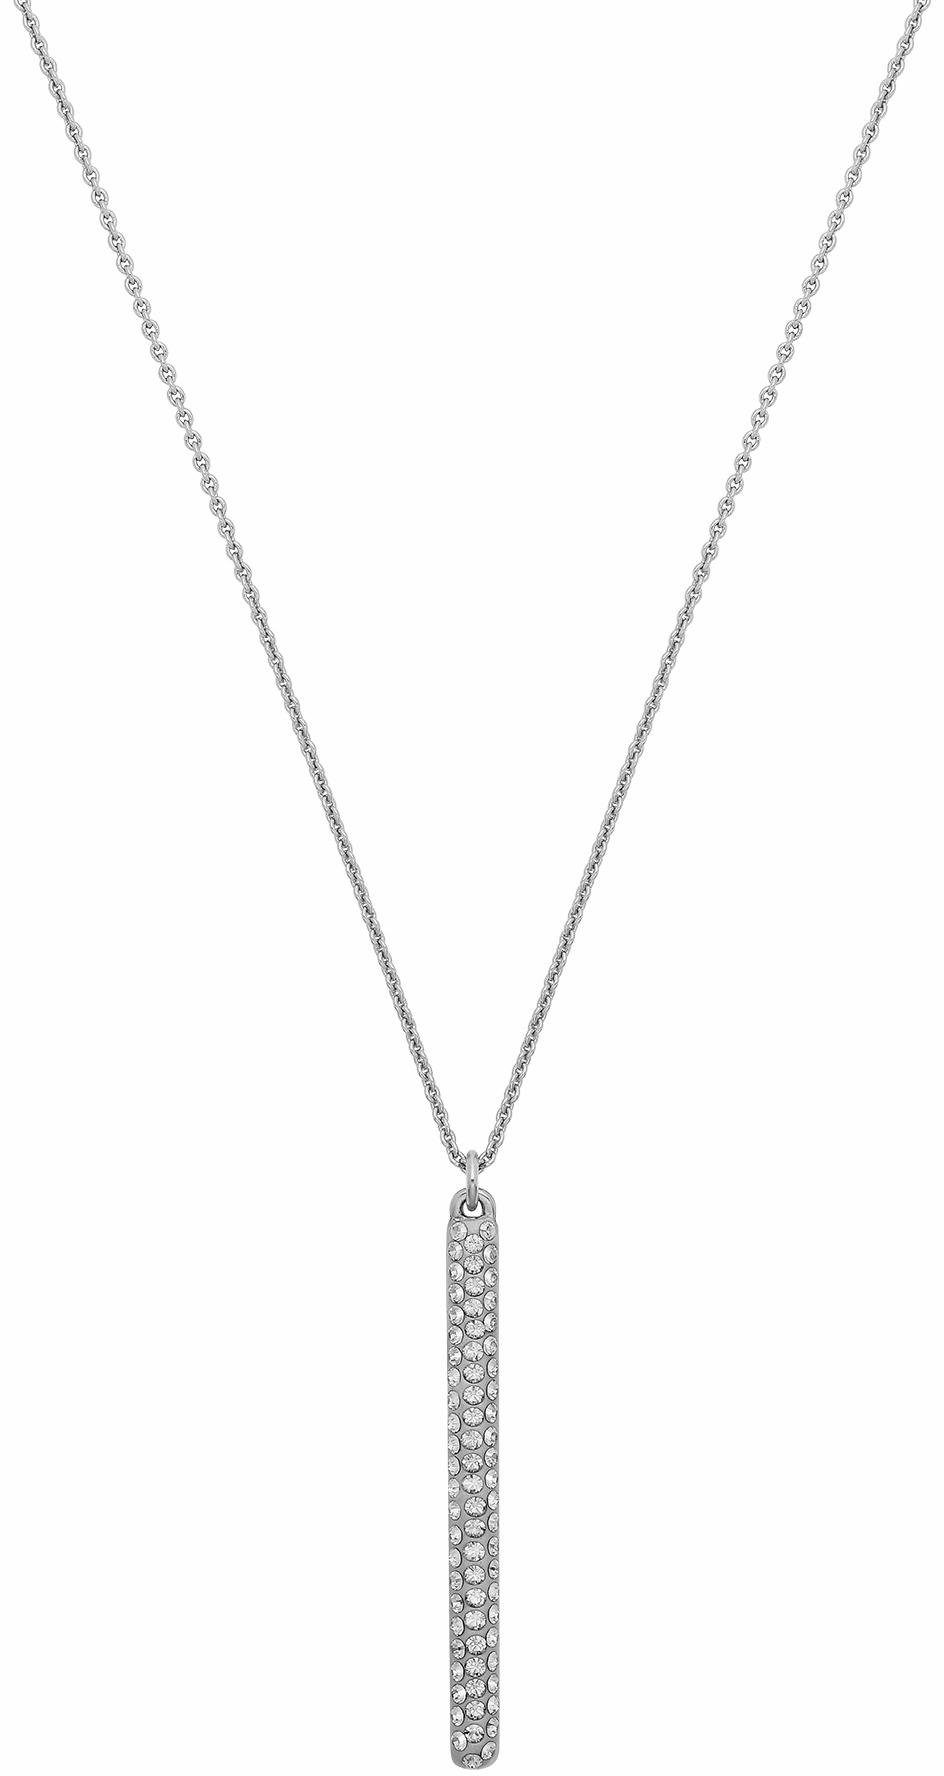 Lolaandgrace Kette mit Anhänger »VEGAS PENDANT, 5216965«, mit Swarovski® Kristallen